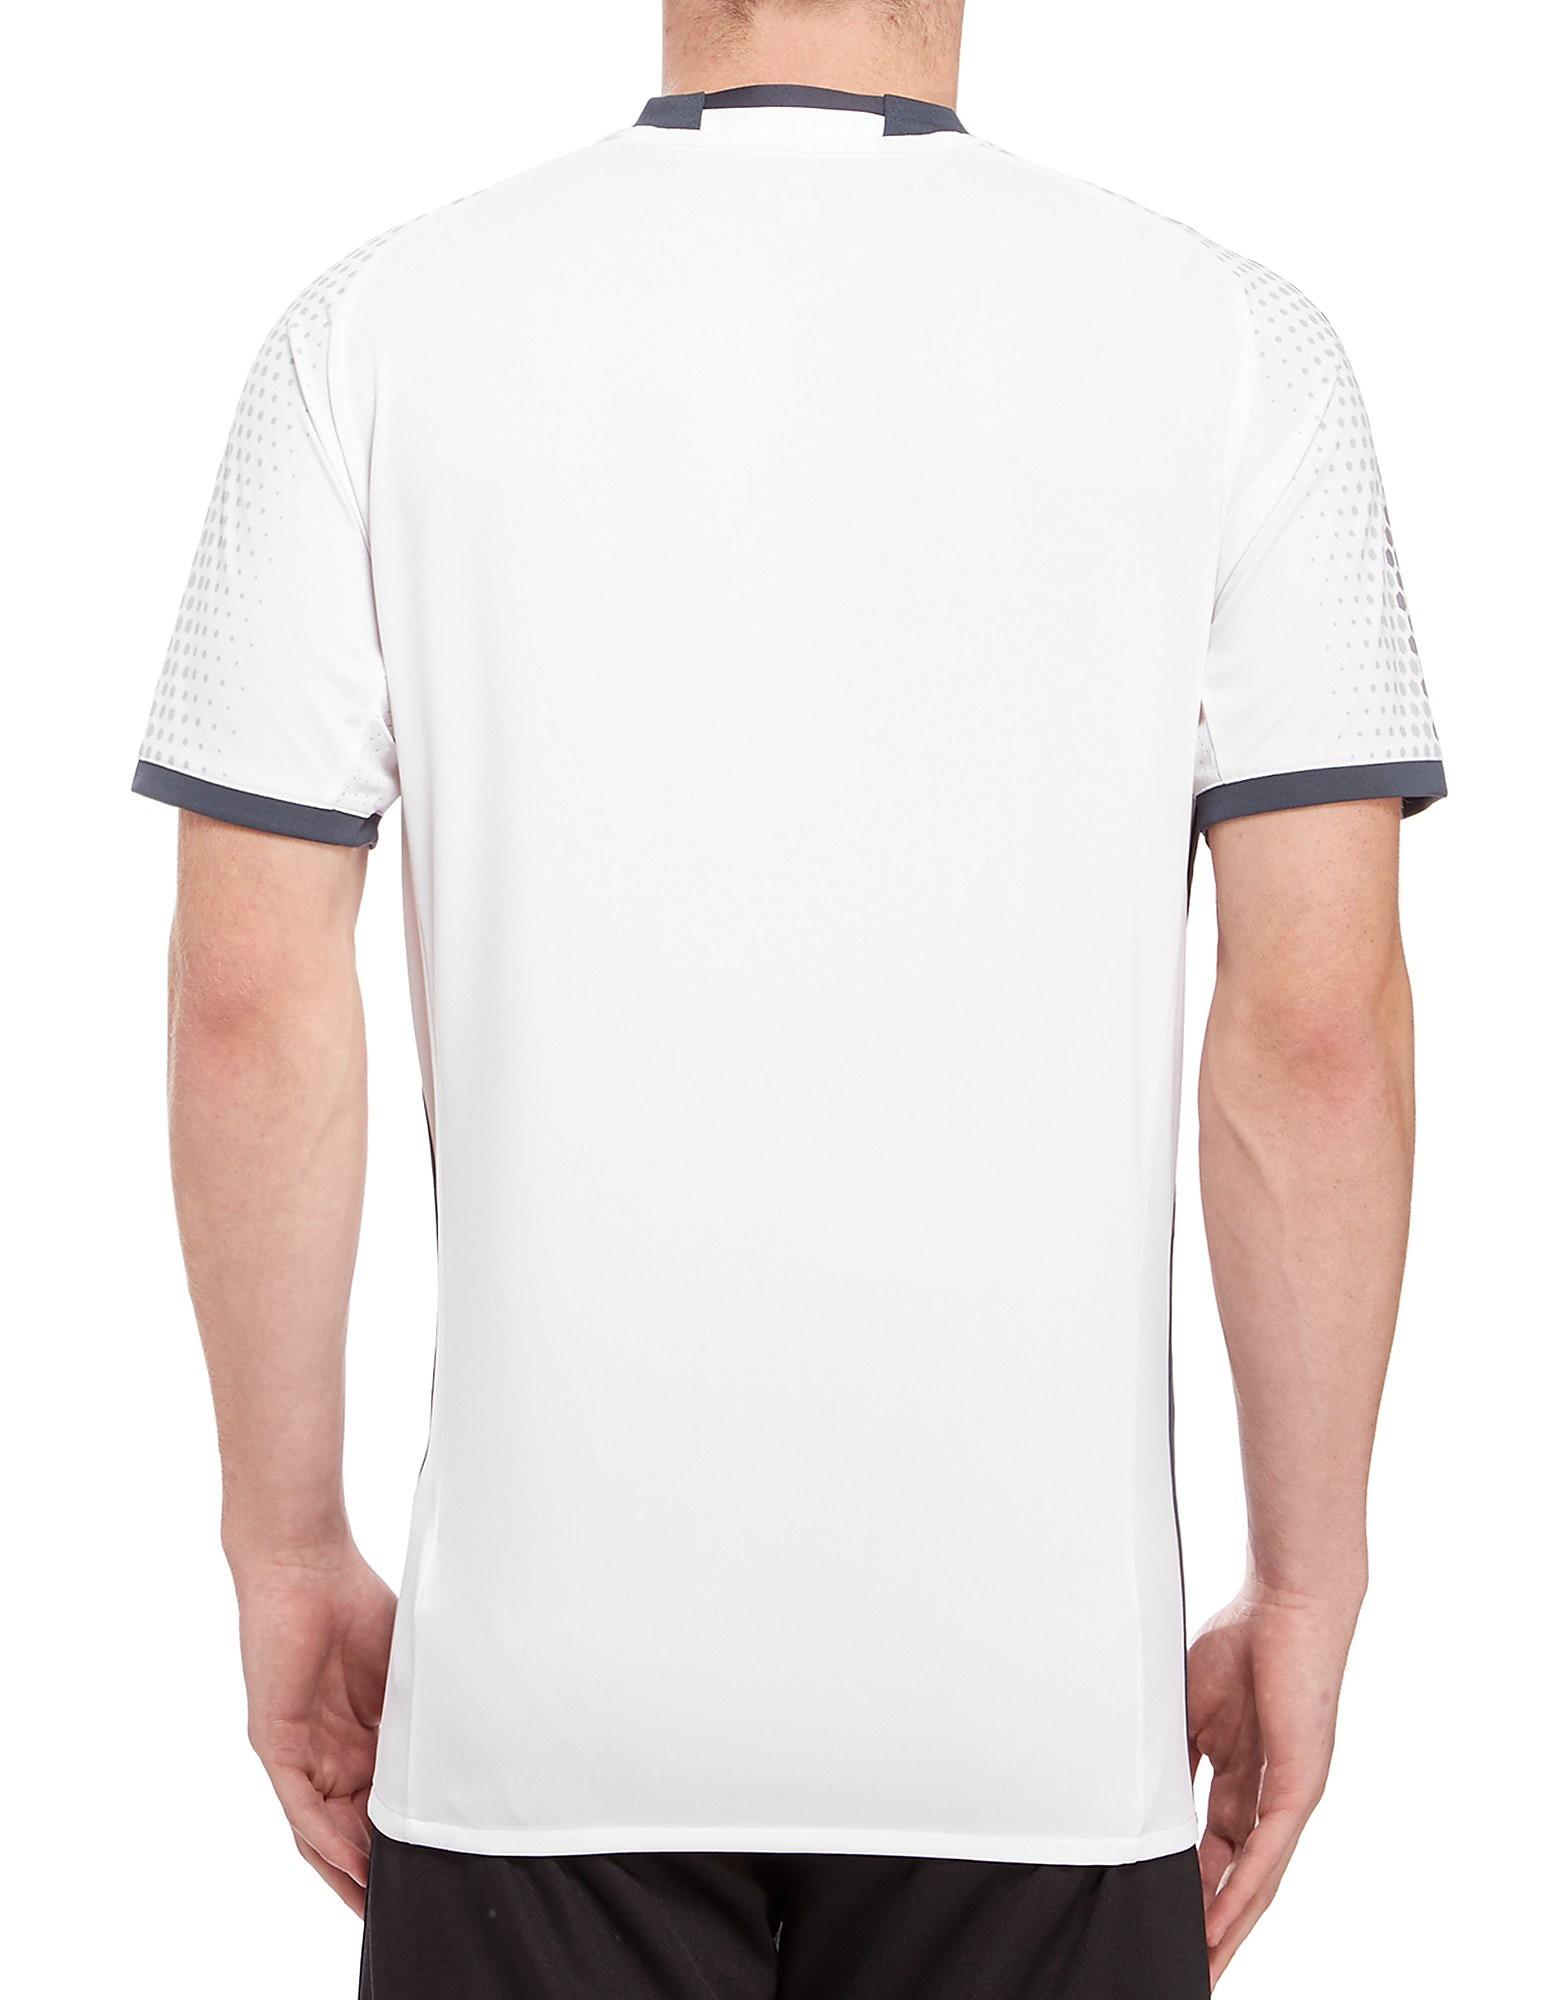 adidas Manchester United 2016/17 Third Shirt